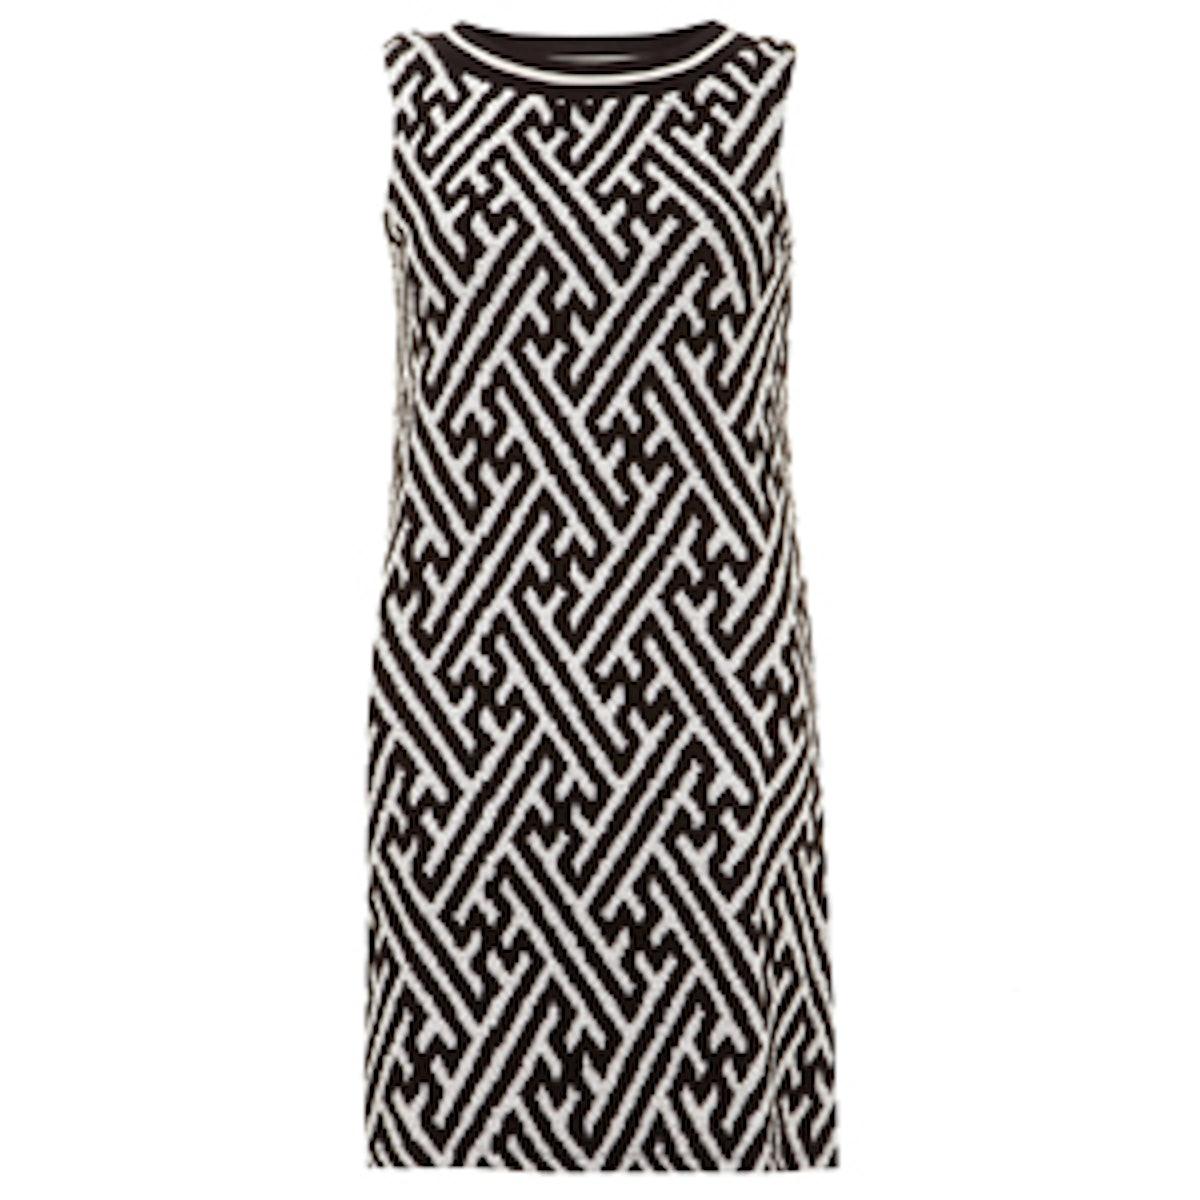 Black & Ivory Shift Dress